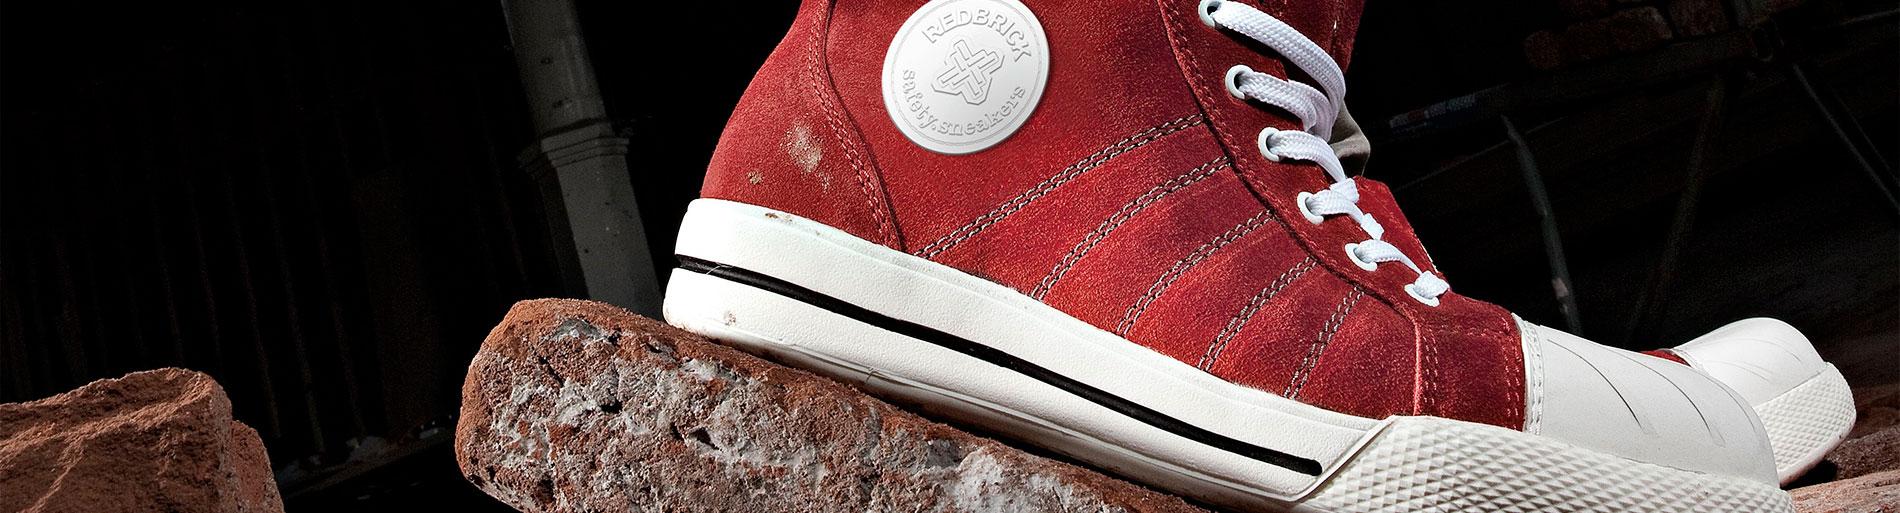 red-brick01